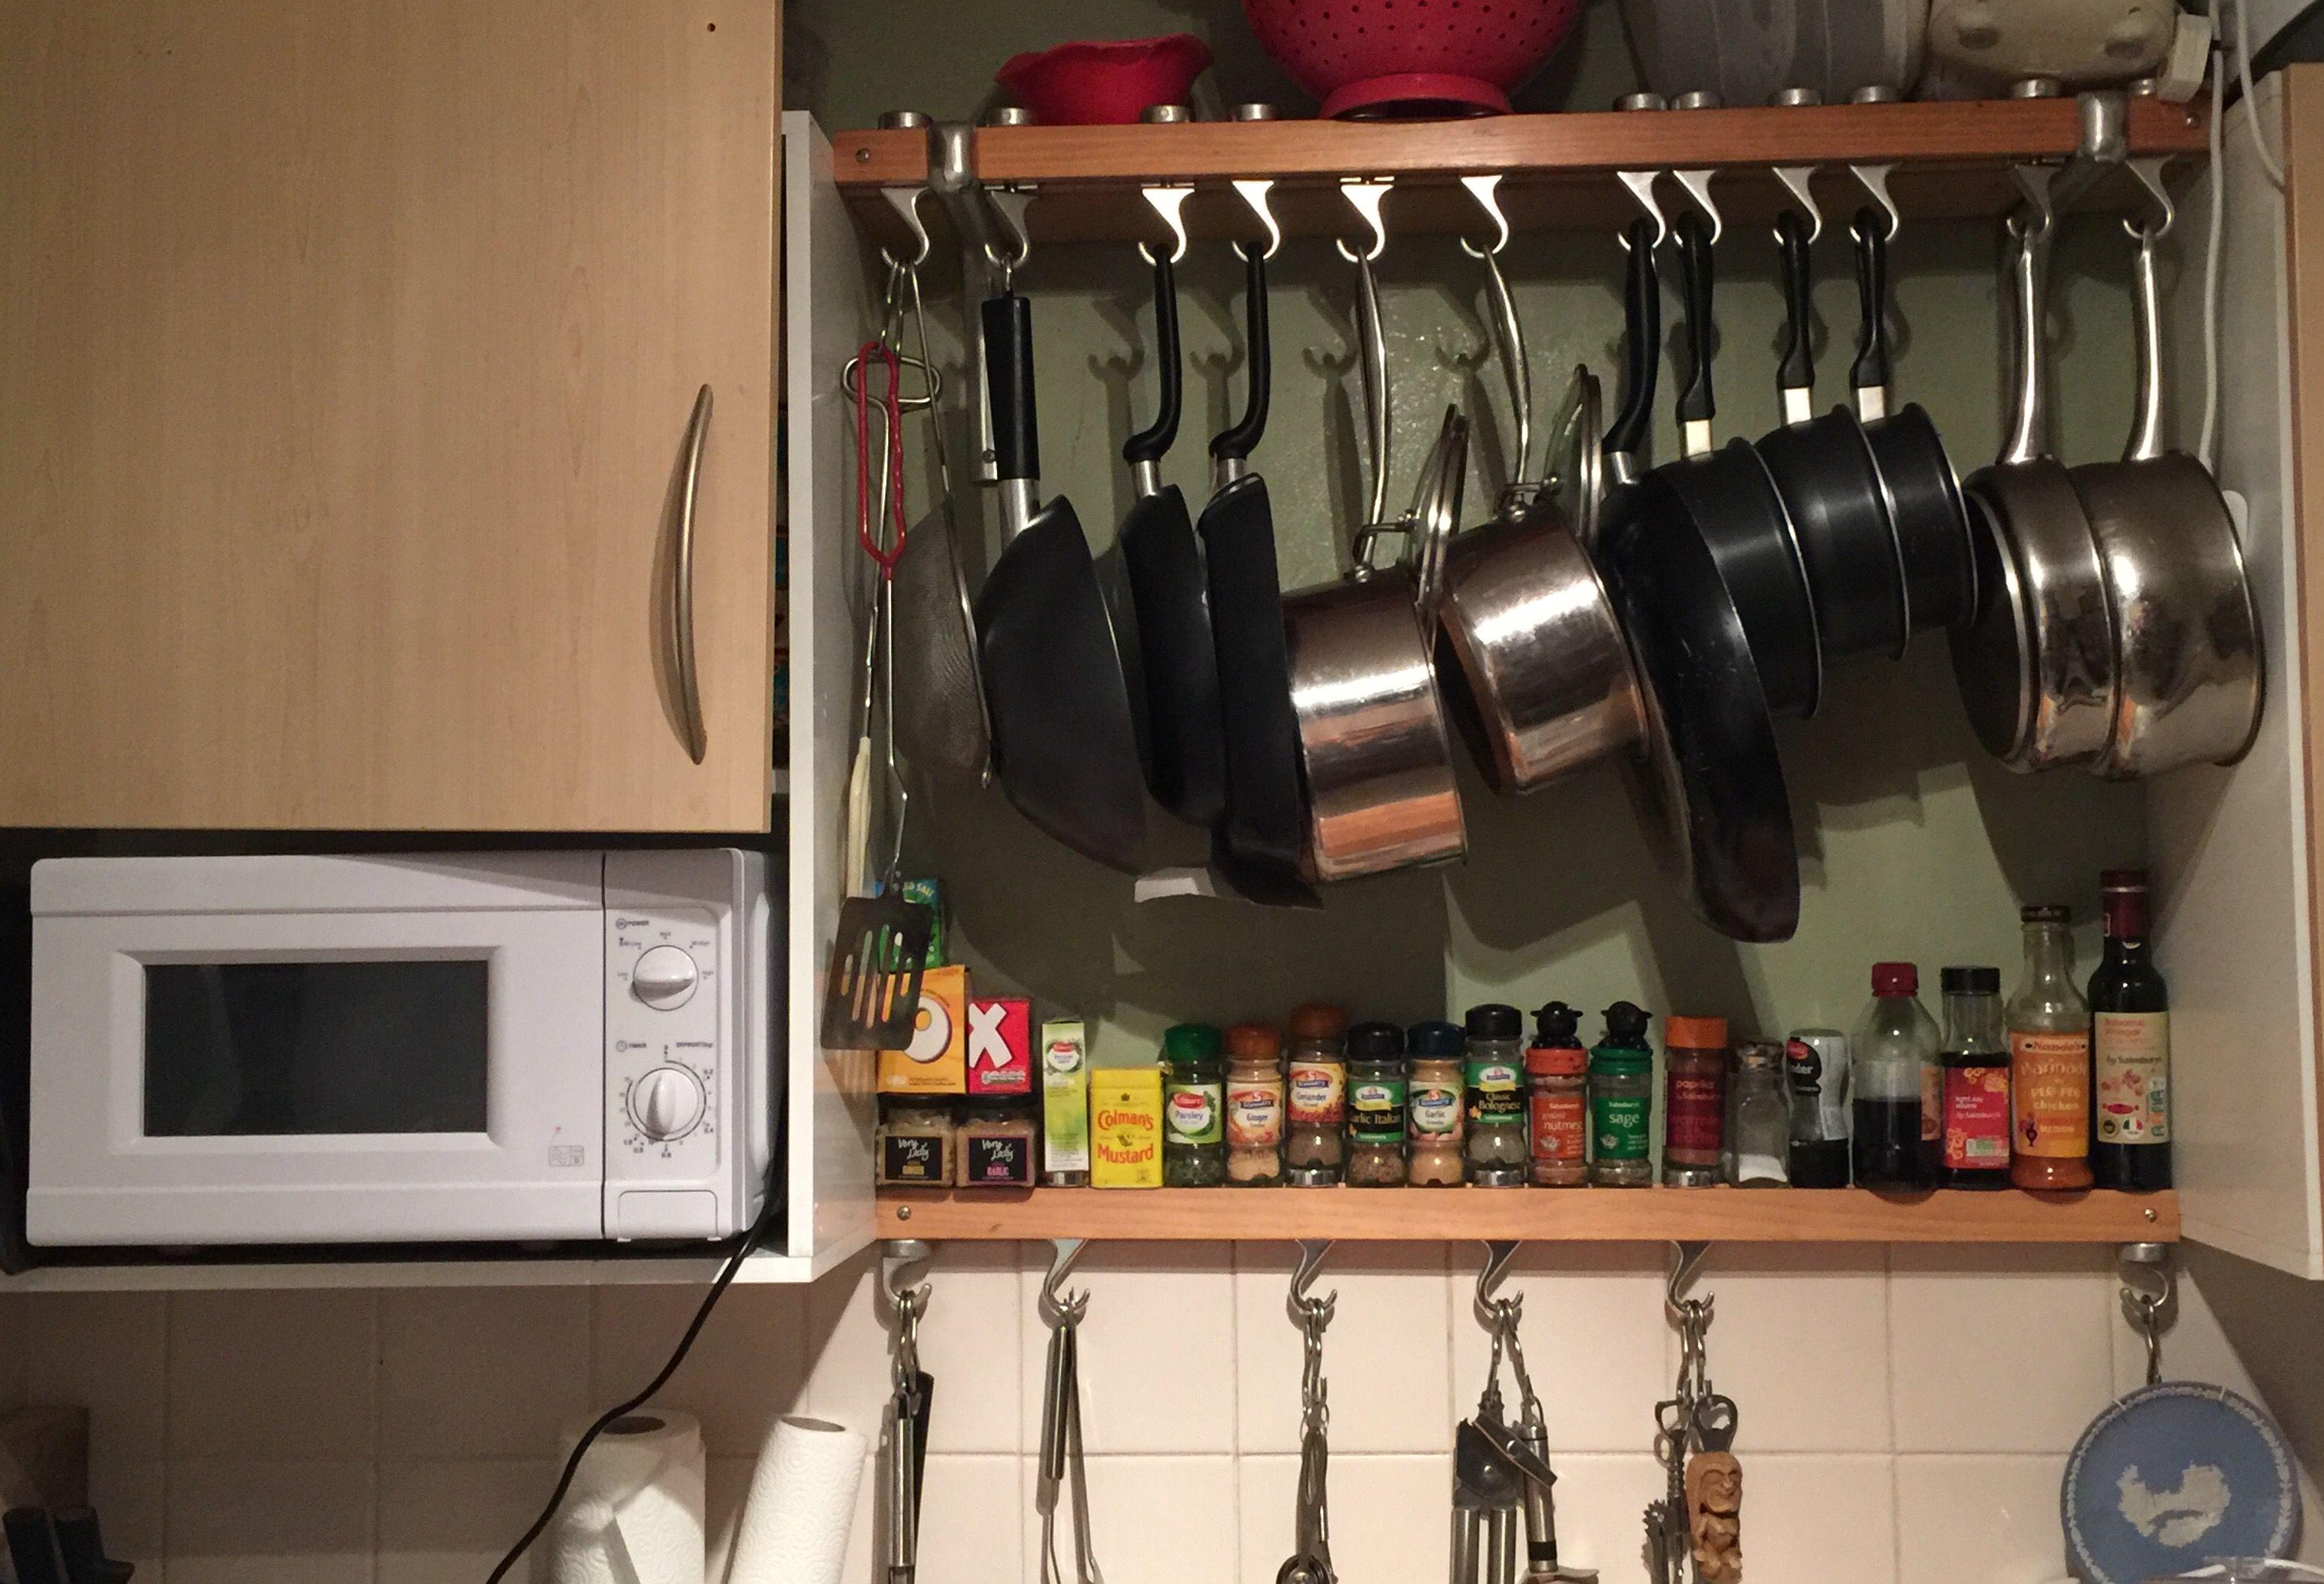 Masterclass wooden kitchen shelf saucepans and frying pans and